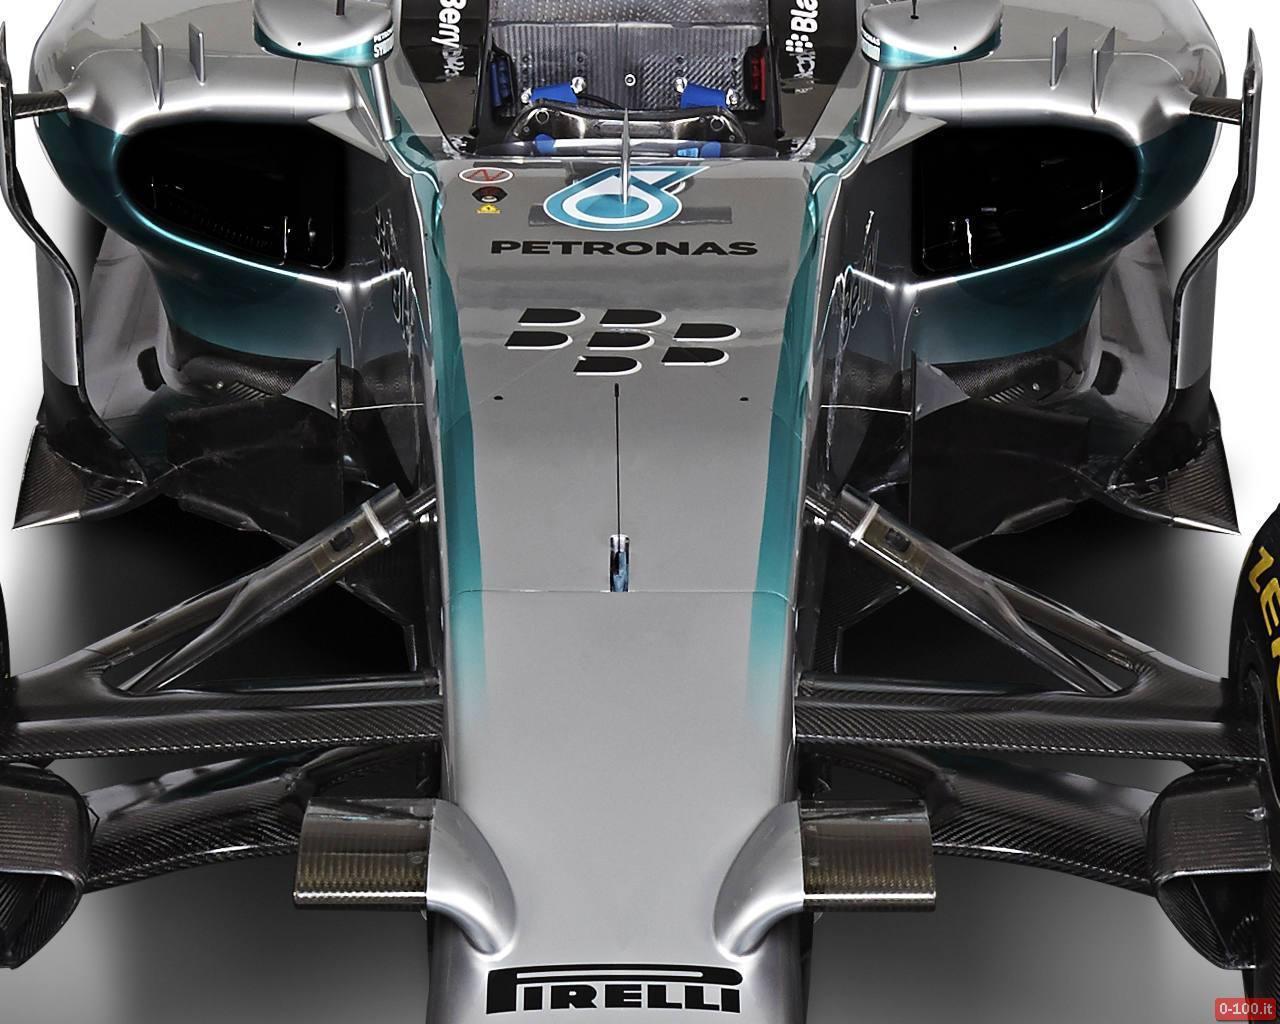 mercedes-amg-petronas-F1-W05-2014-Rosberg-Hamilton-0-100_15